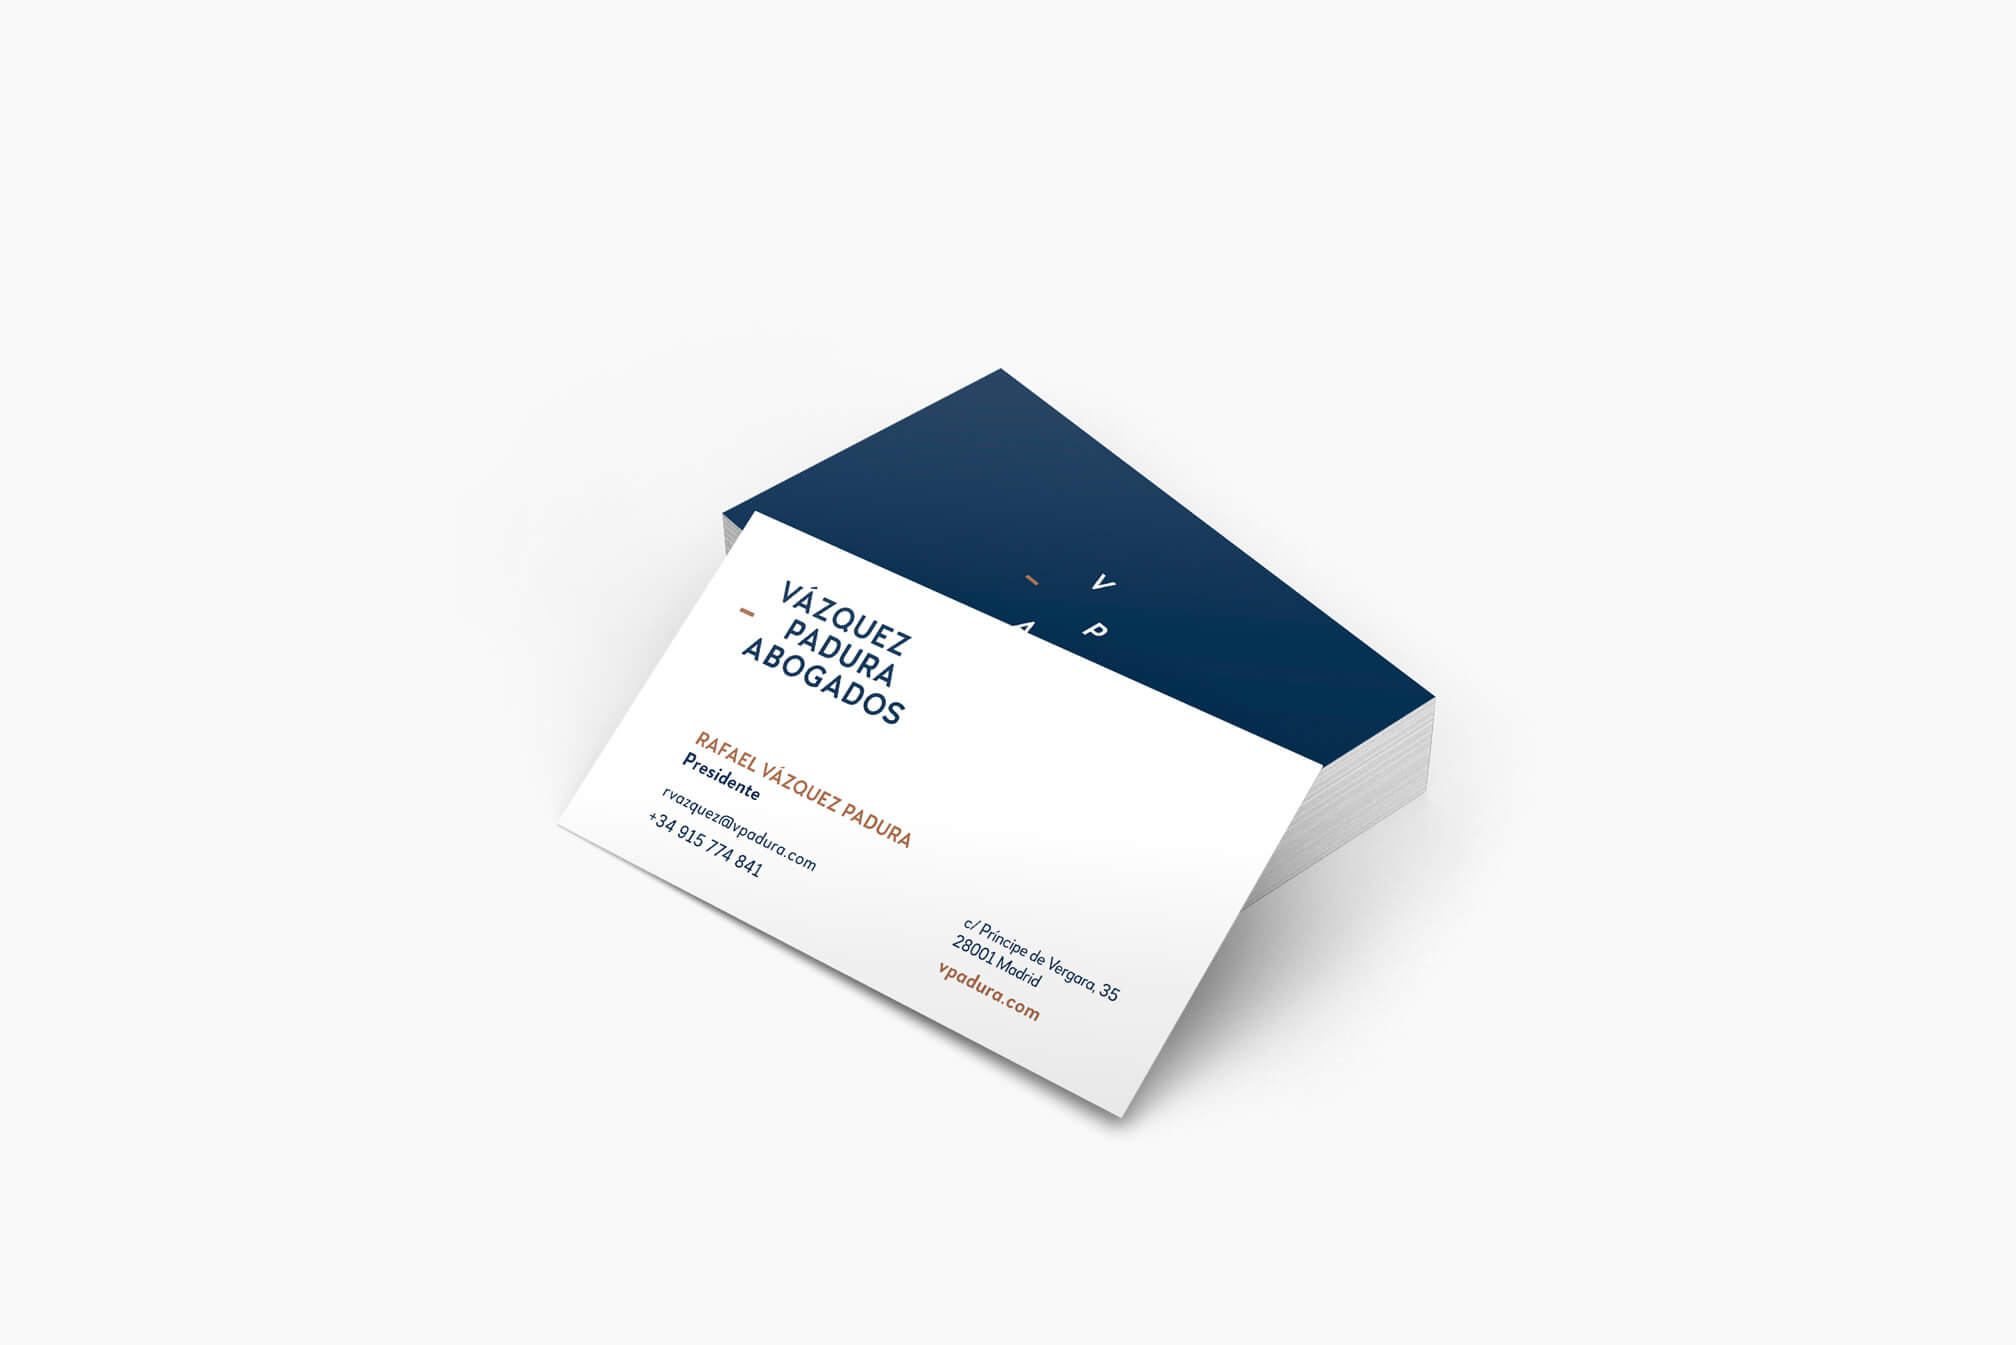 Agencia de branding Madrid | branding legal